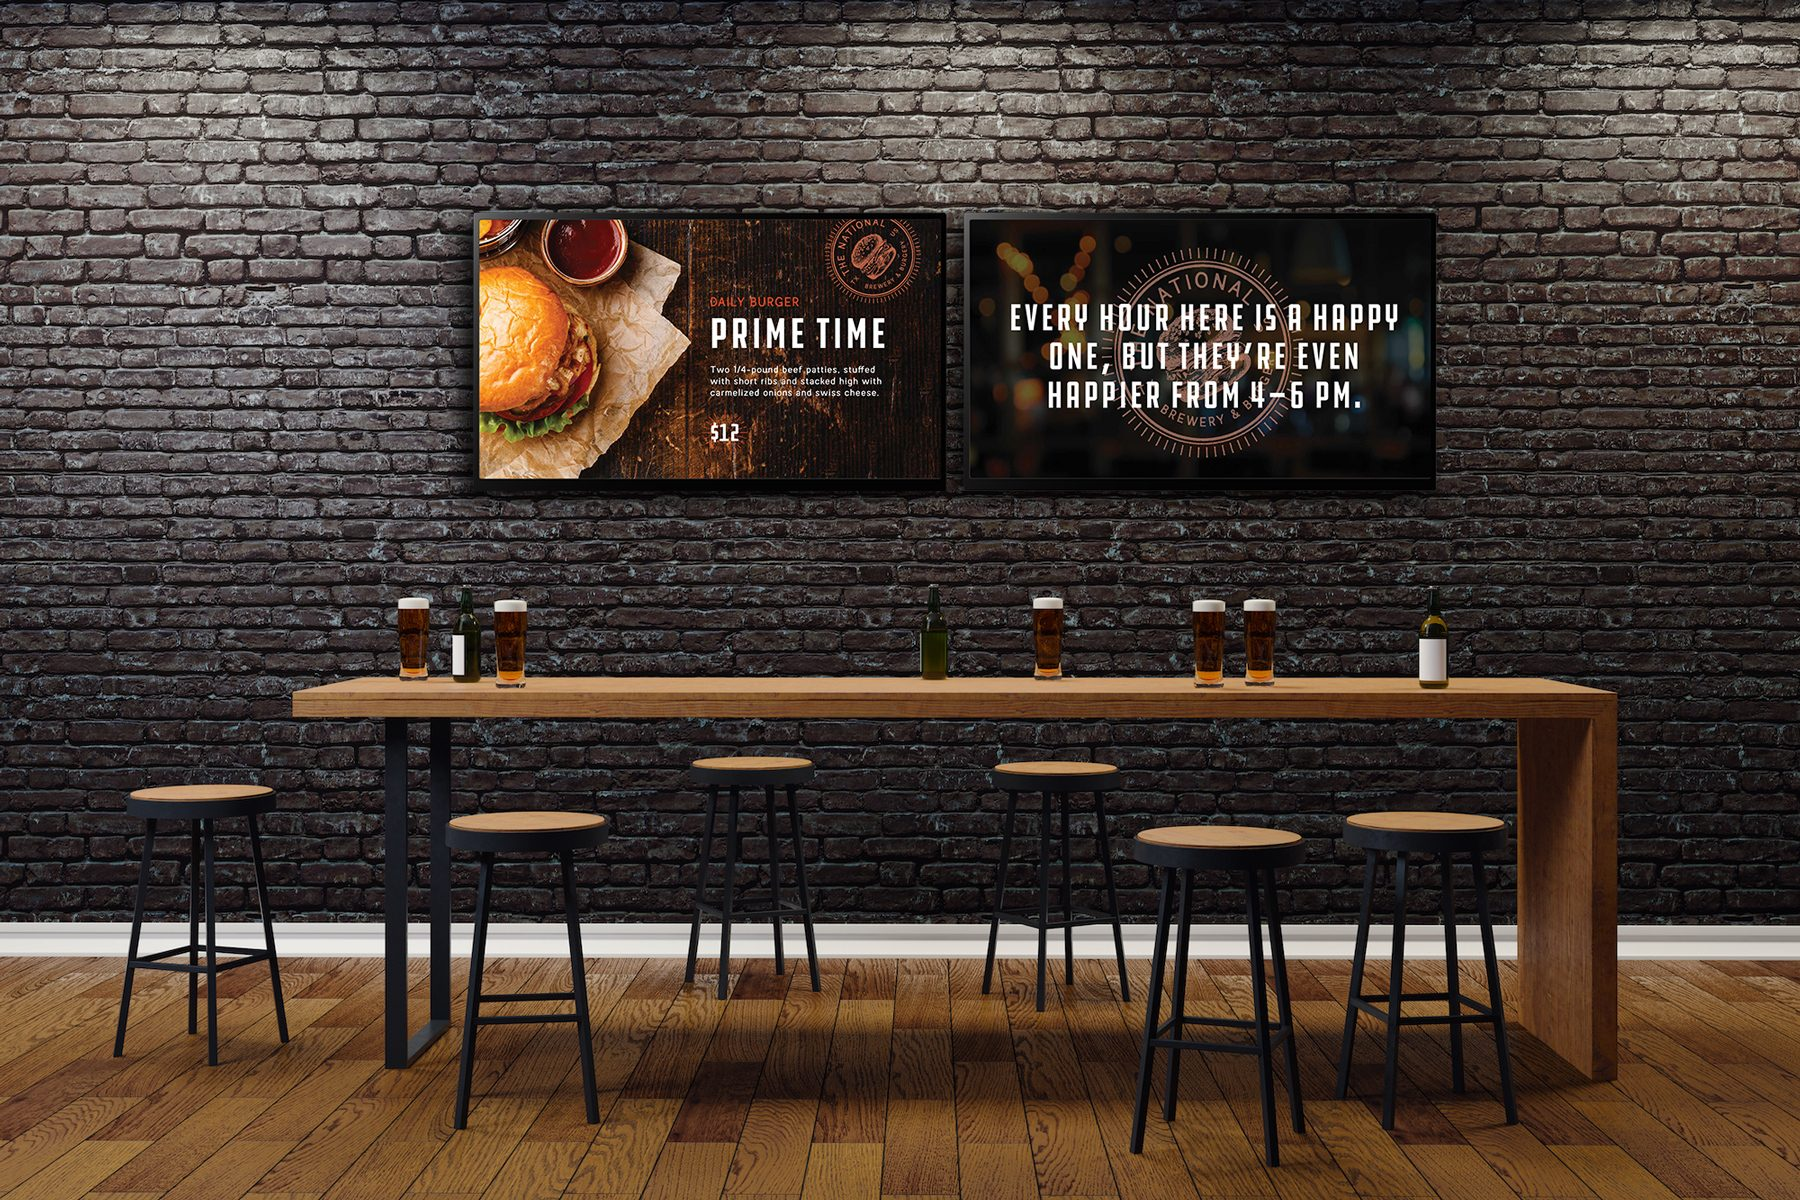 digital signage in brewery